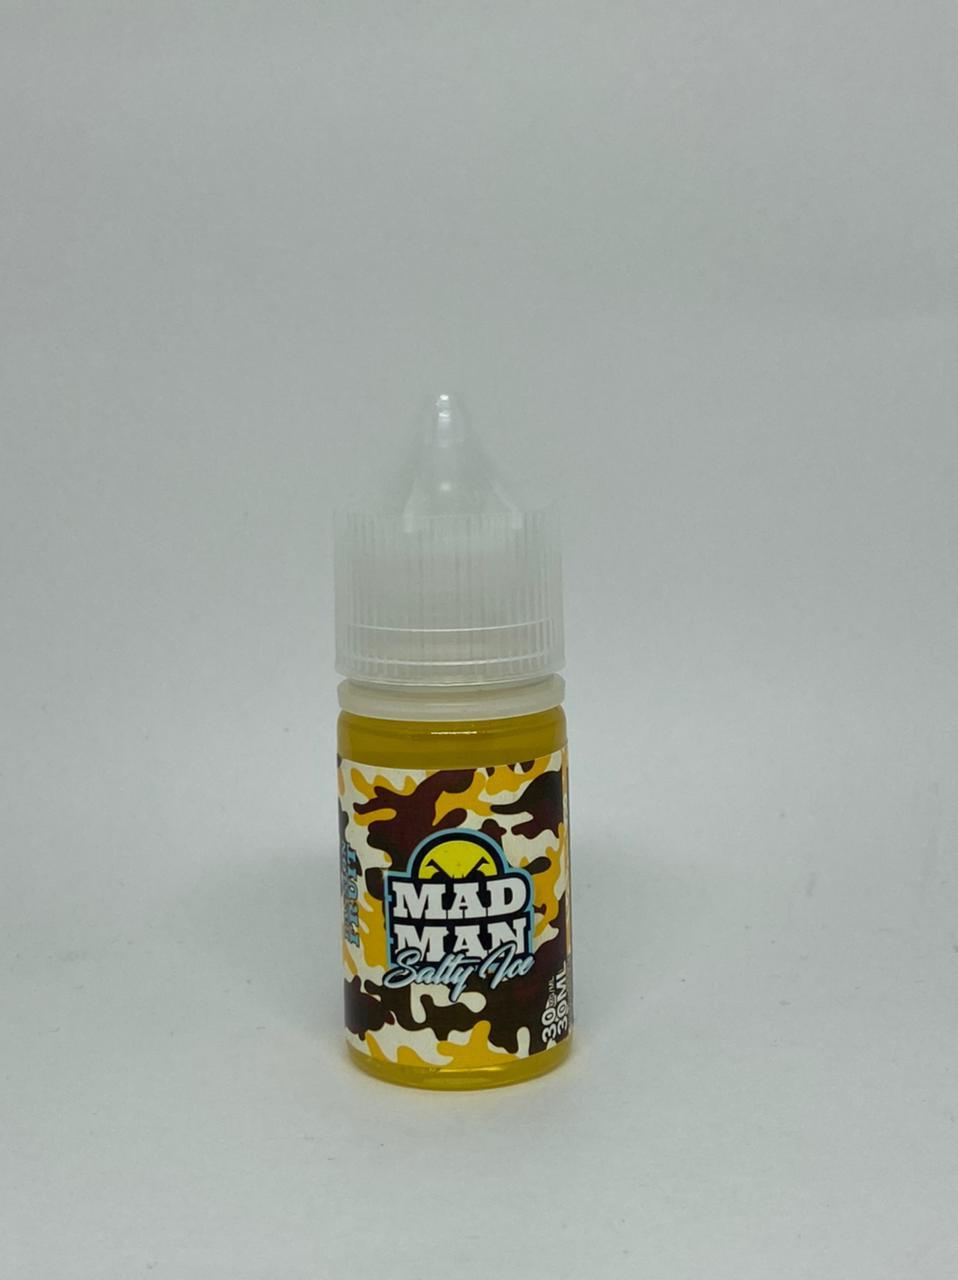 MAD MAN - Passion Fruit Salt 30ml